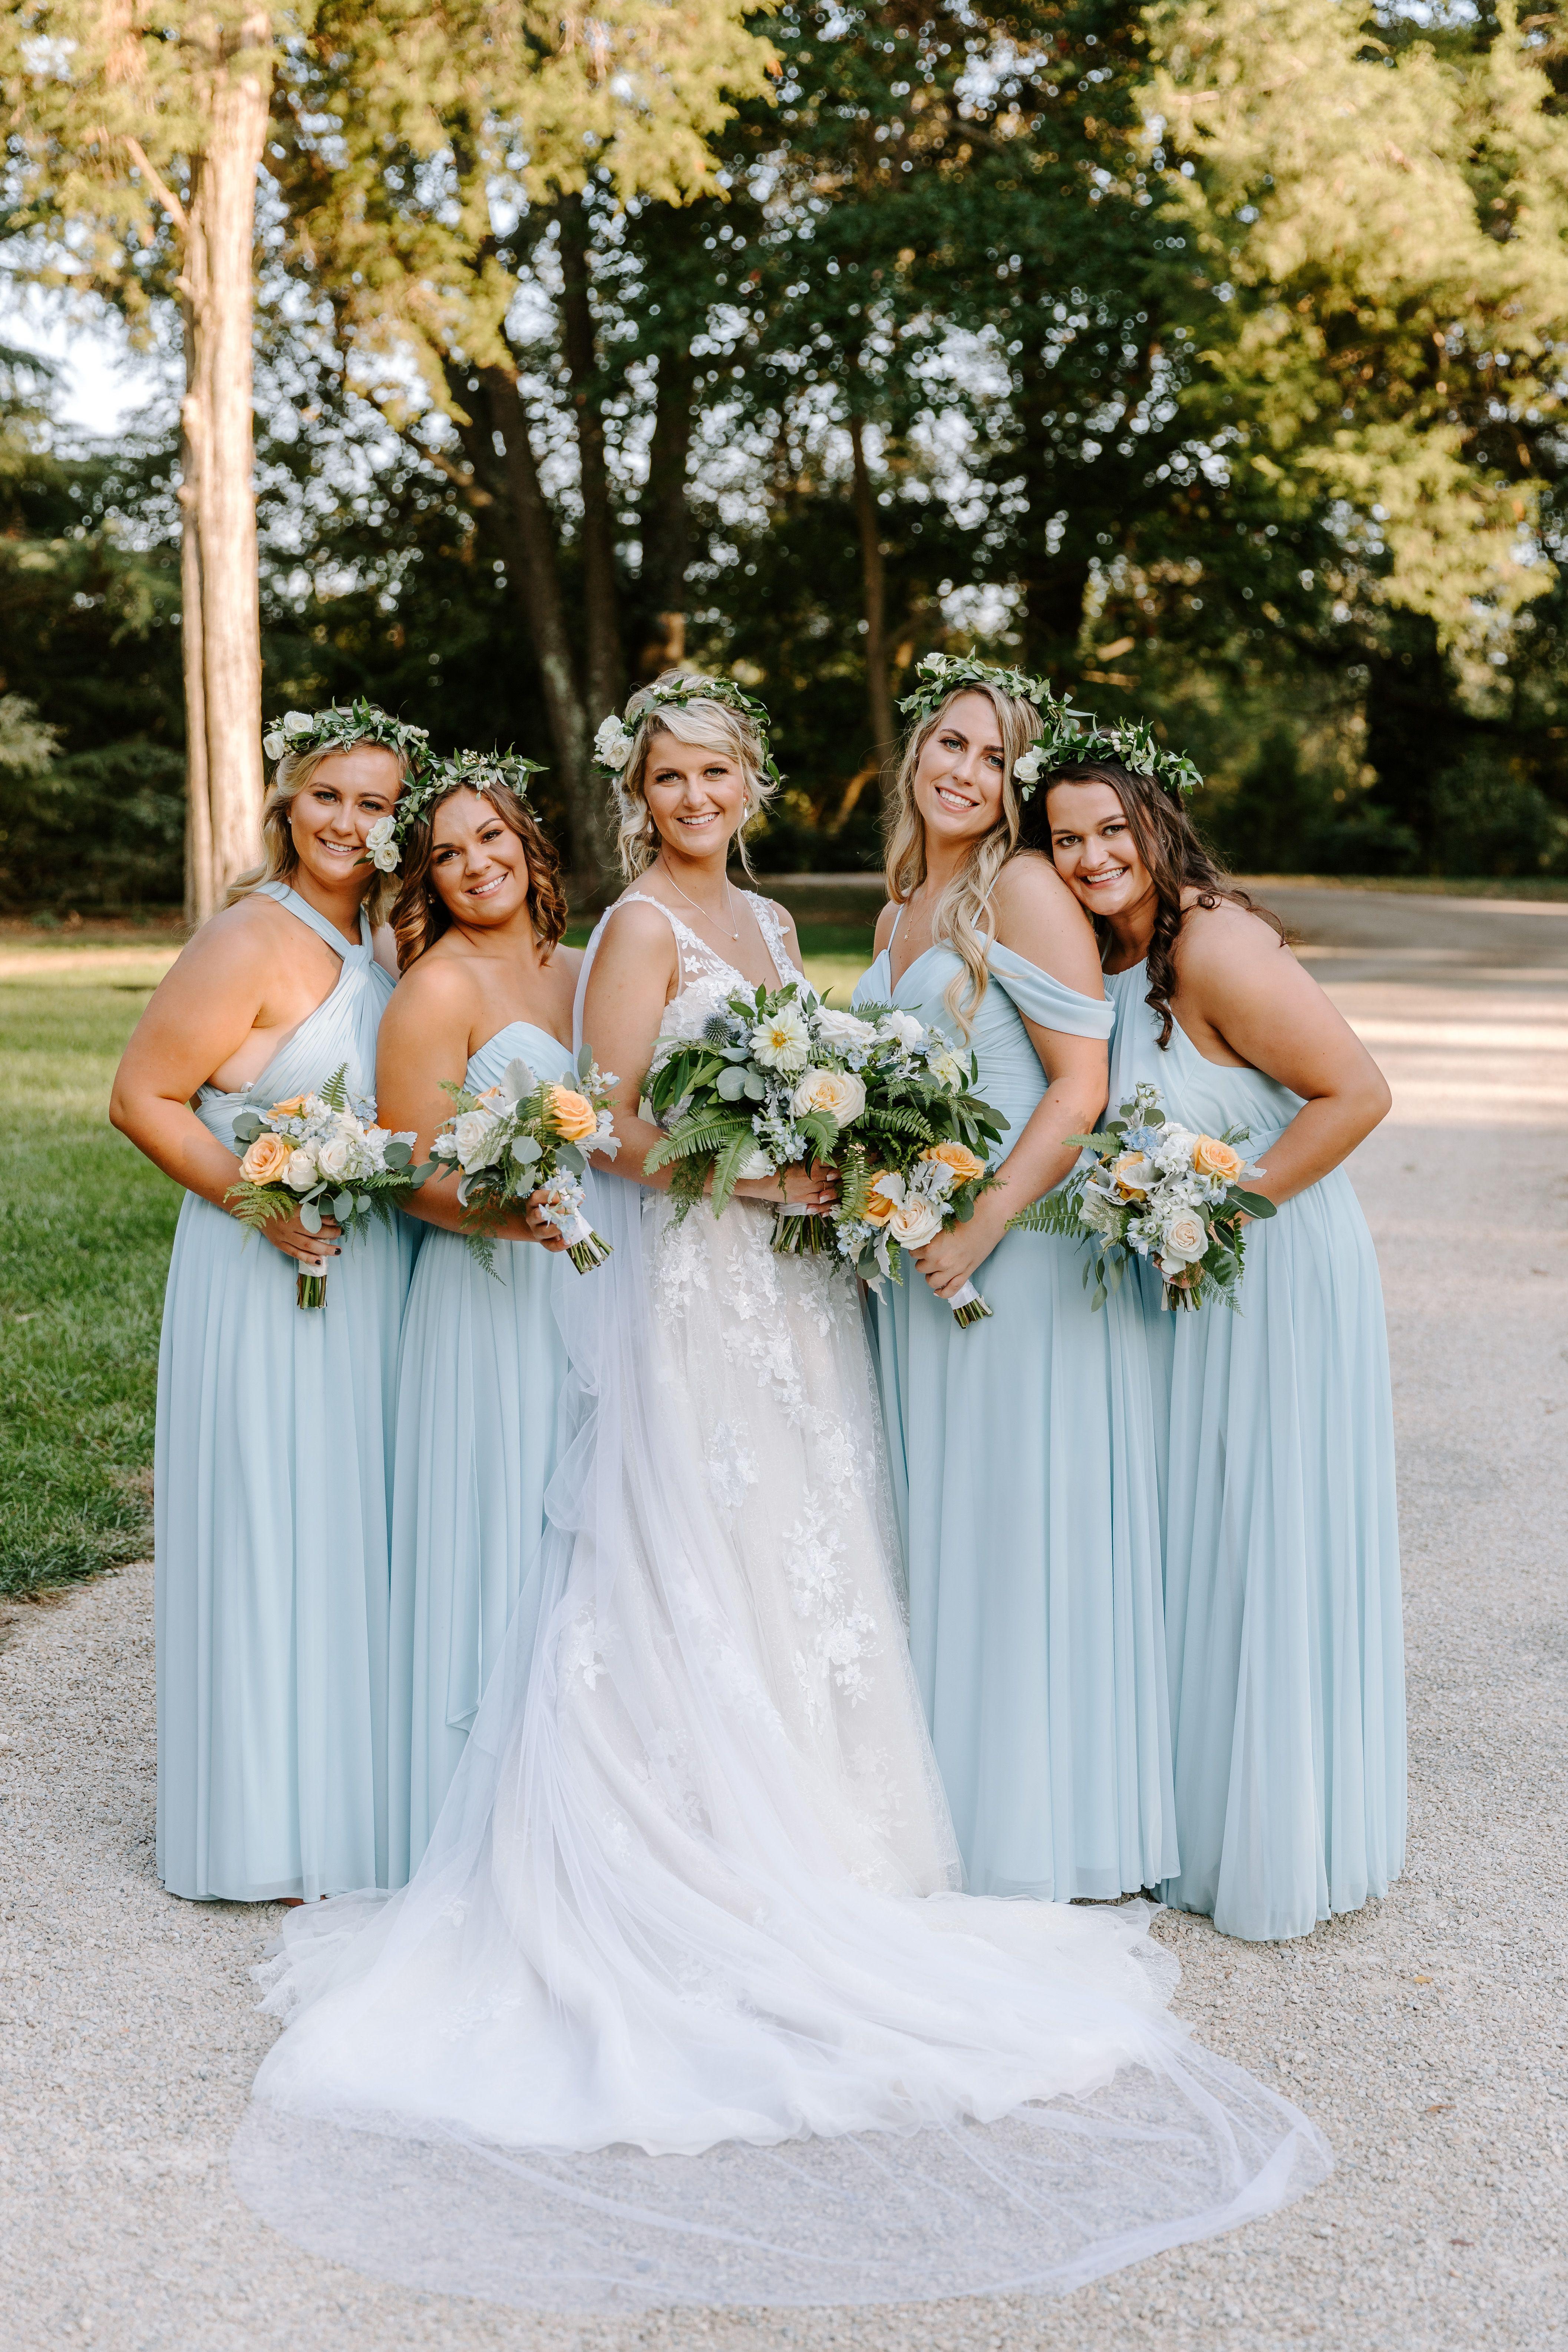 Blue Bridesmaids Dresses Ice Blue Bridesmaid Dress Blue Bridesmaid Dresses Maroon Wedding [ 6343 x 4229 Pixel ]